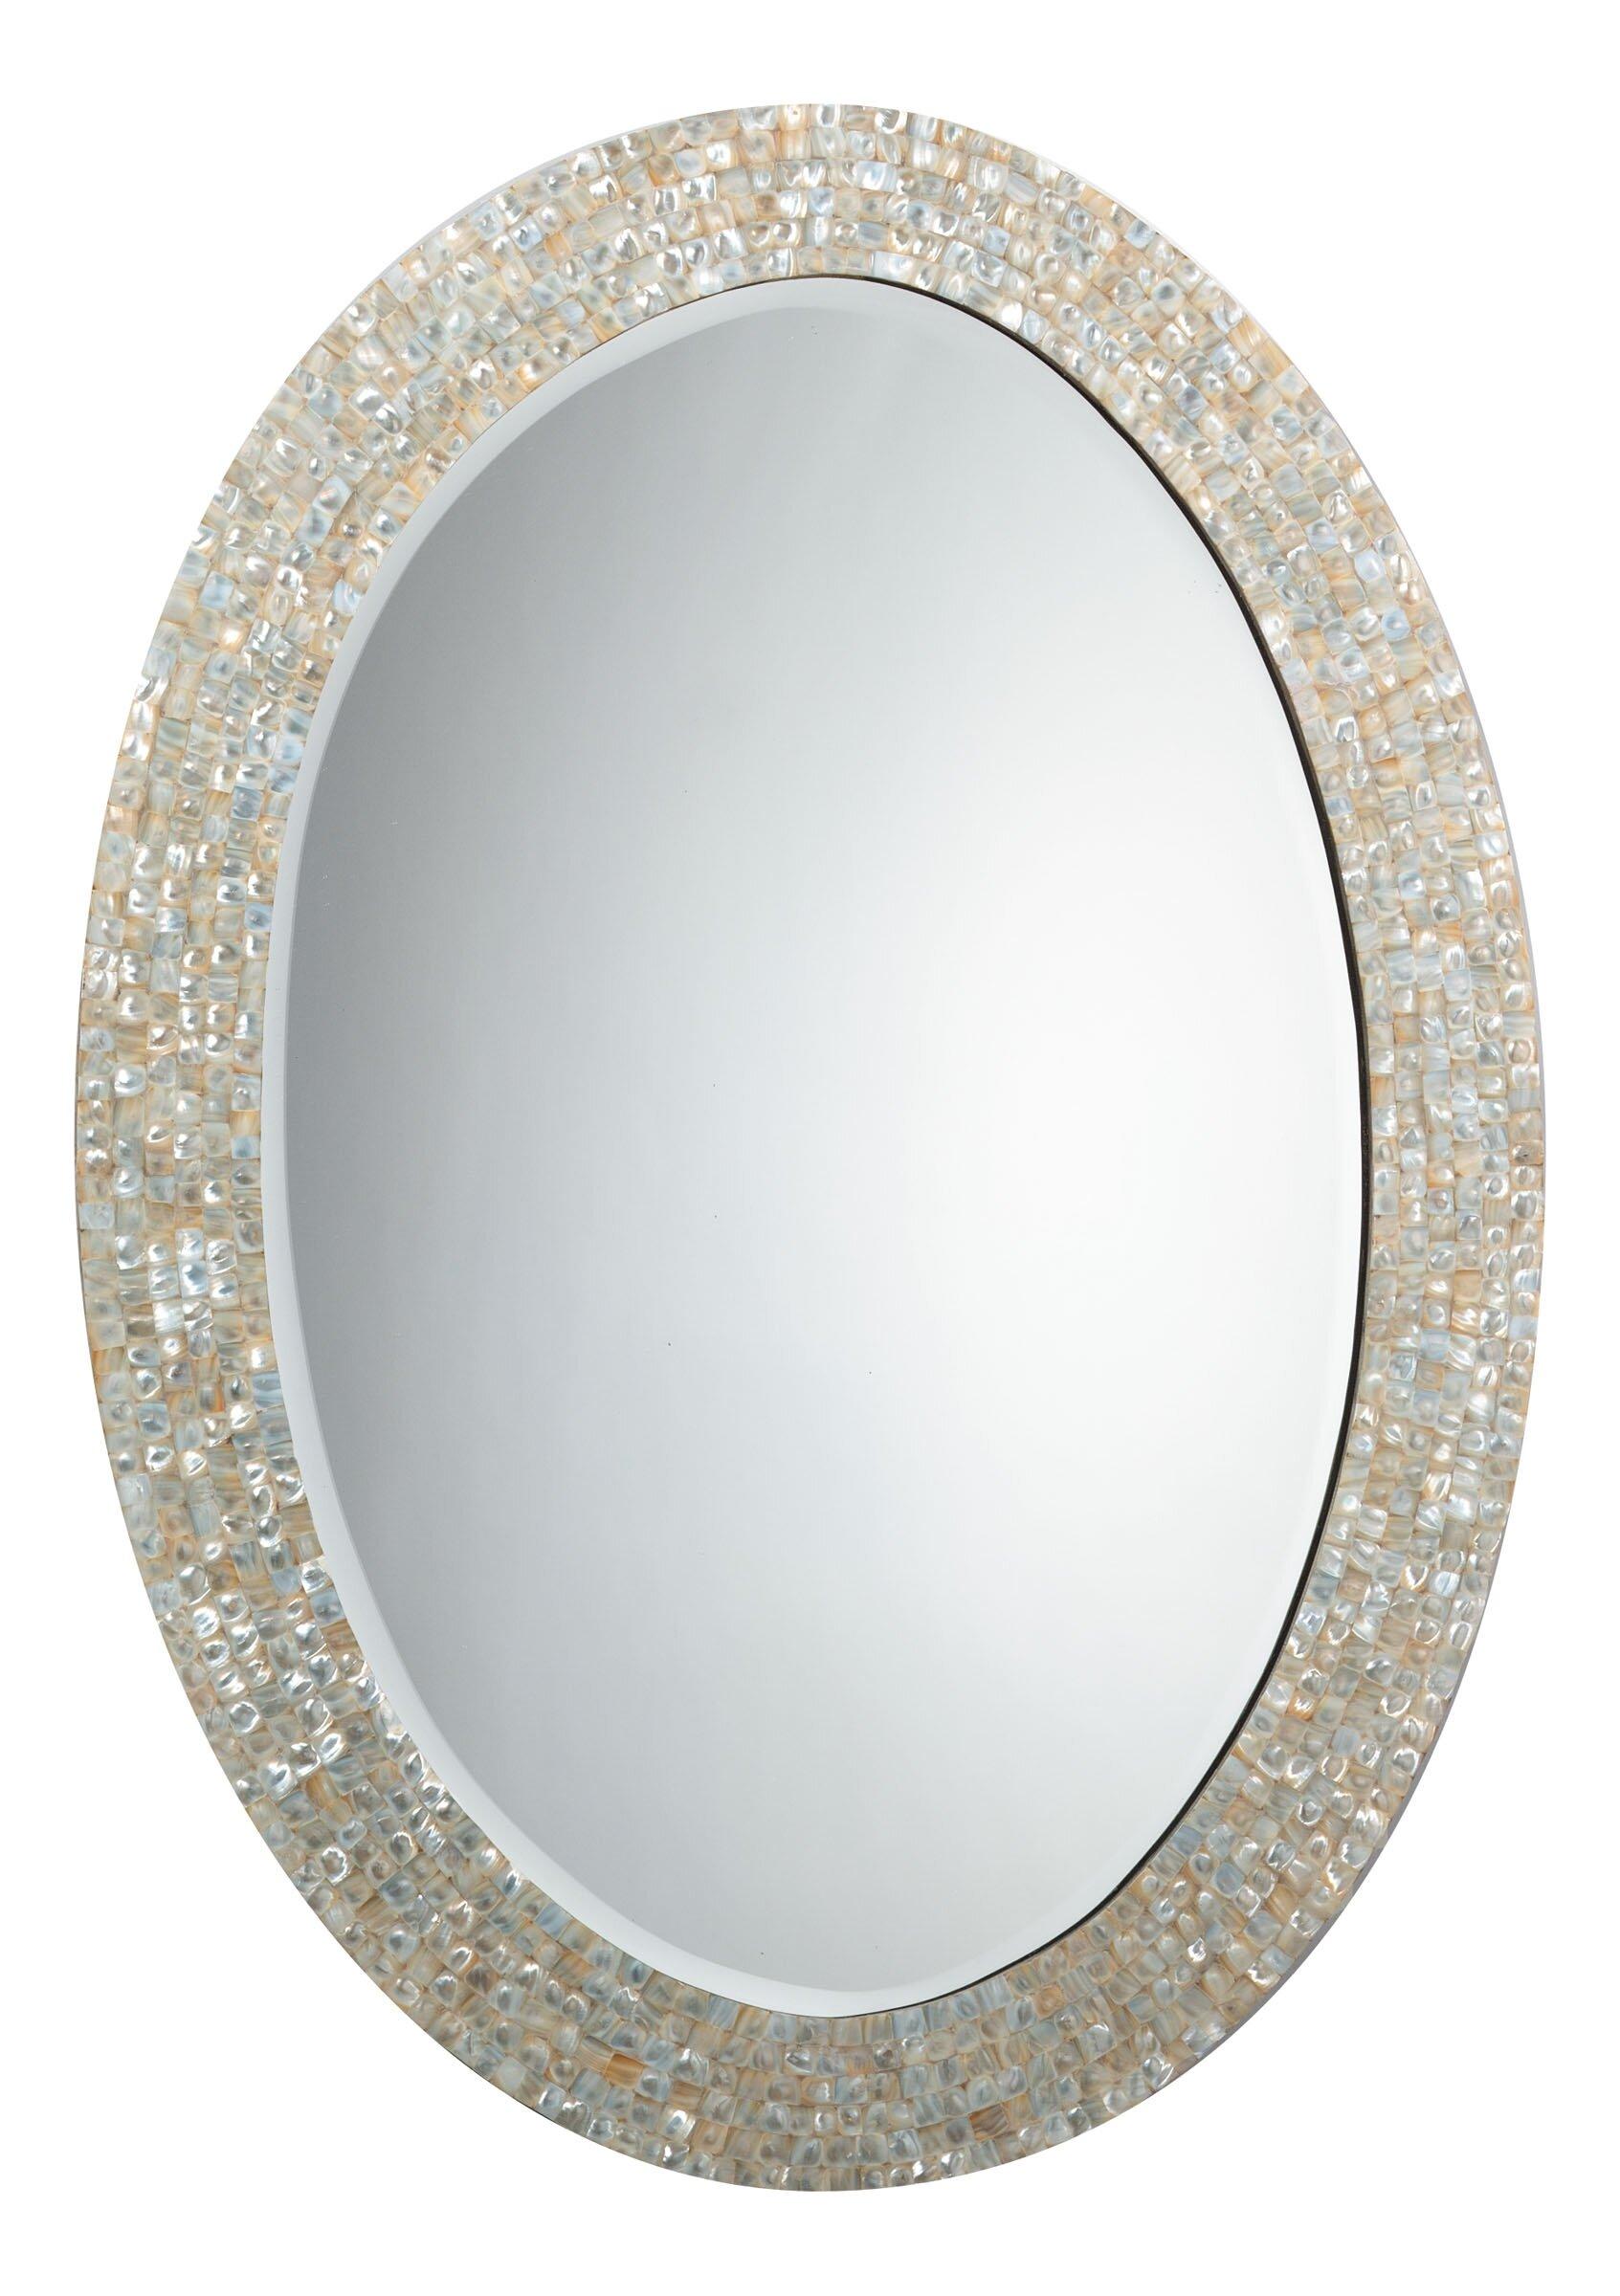 Highland dunes elsie oval mother of pearl mirror wayfair